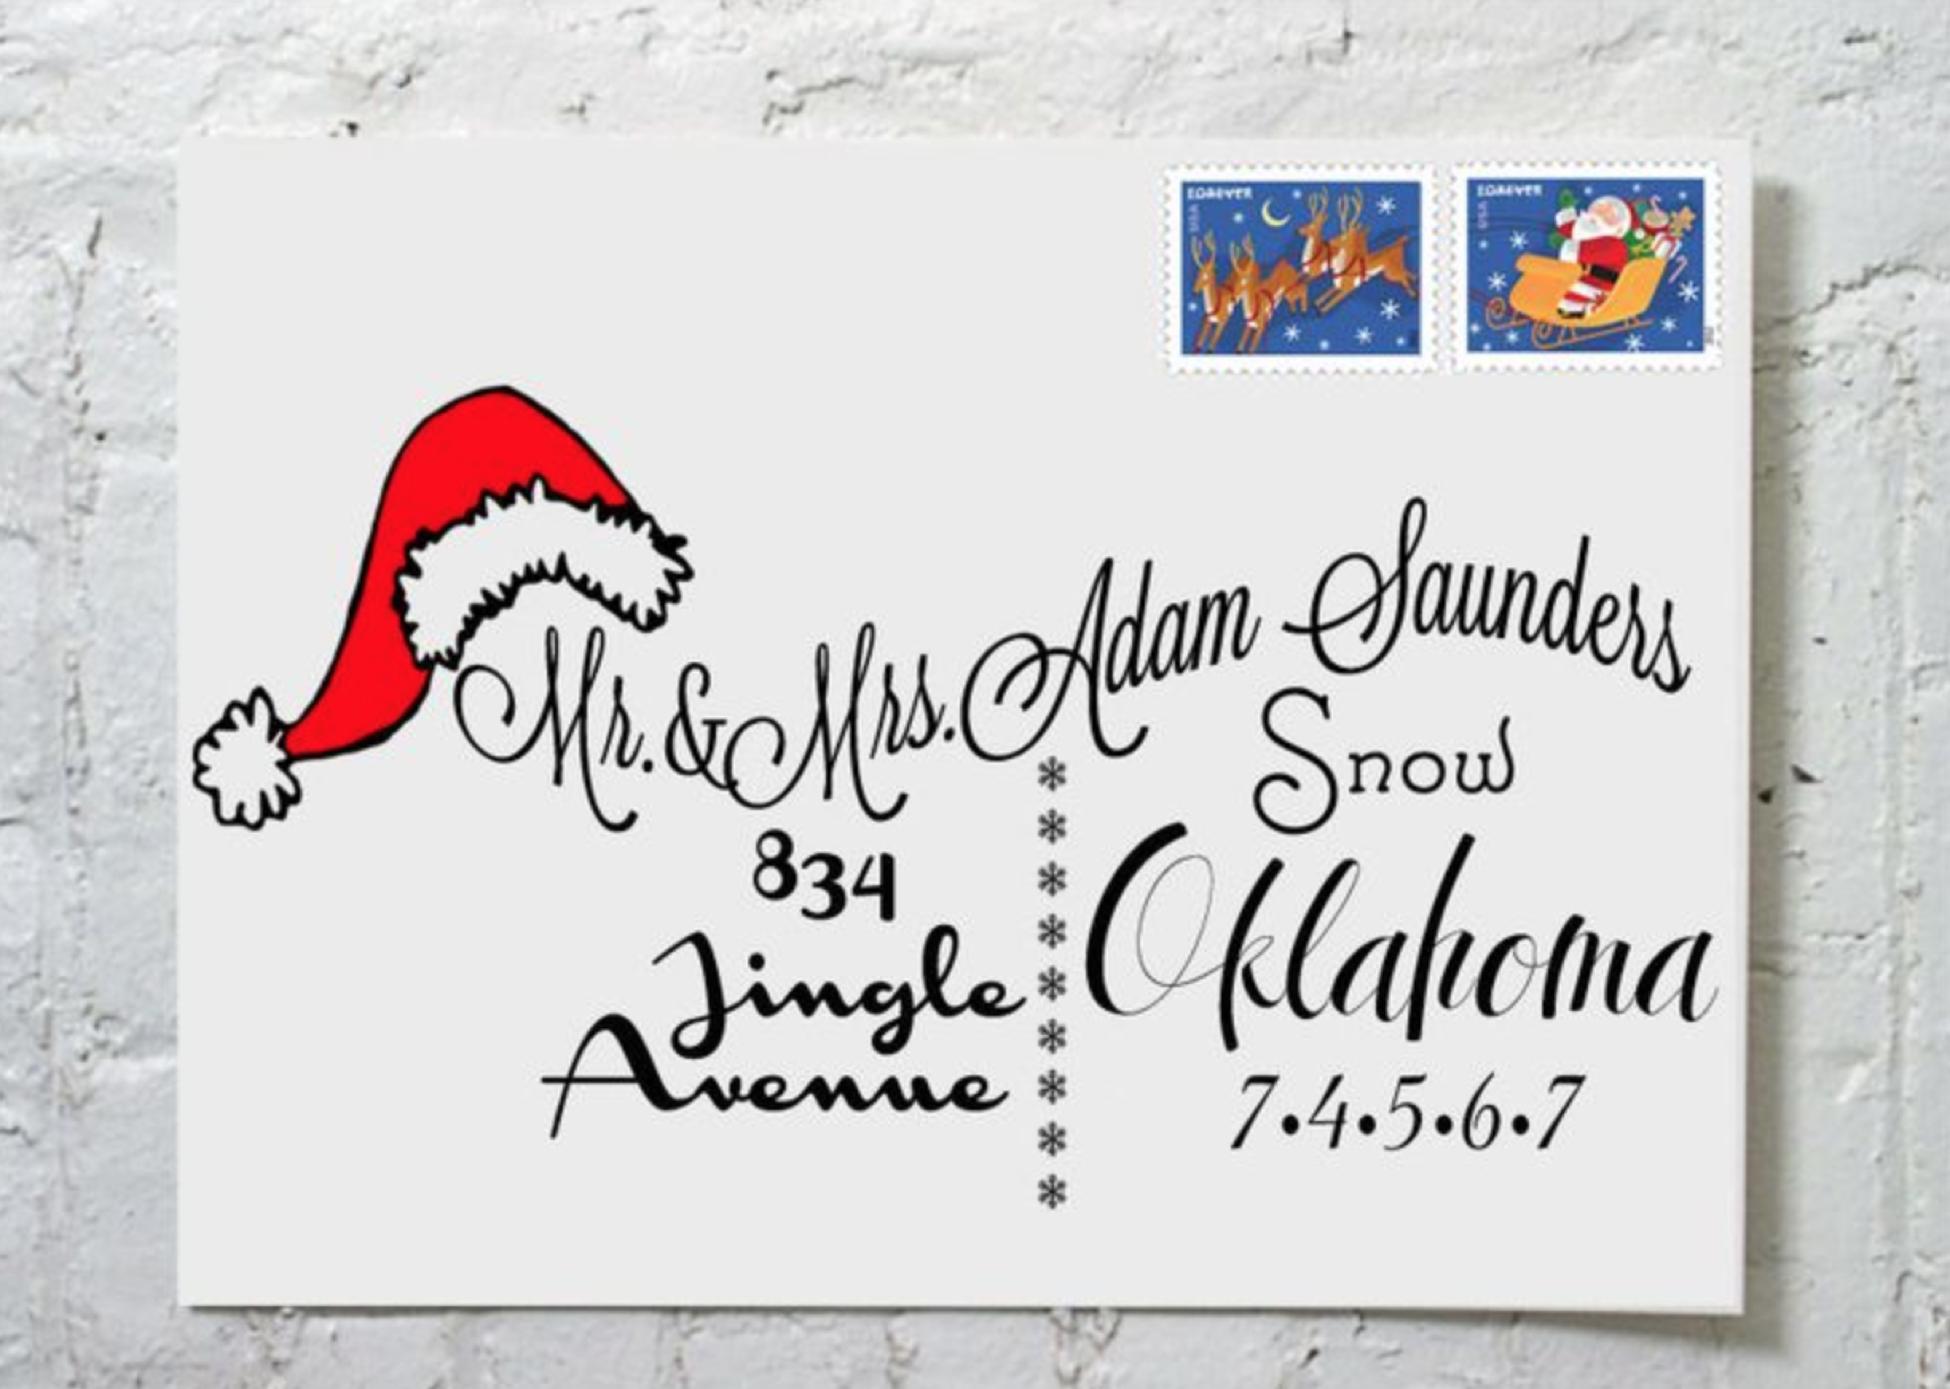 Creating Customer Appreciation Through Holiday Cards